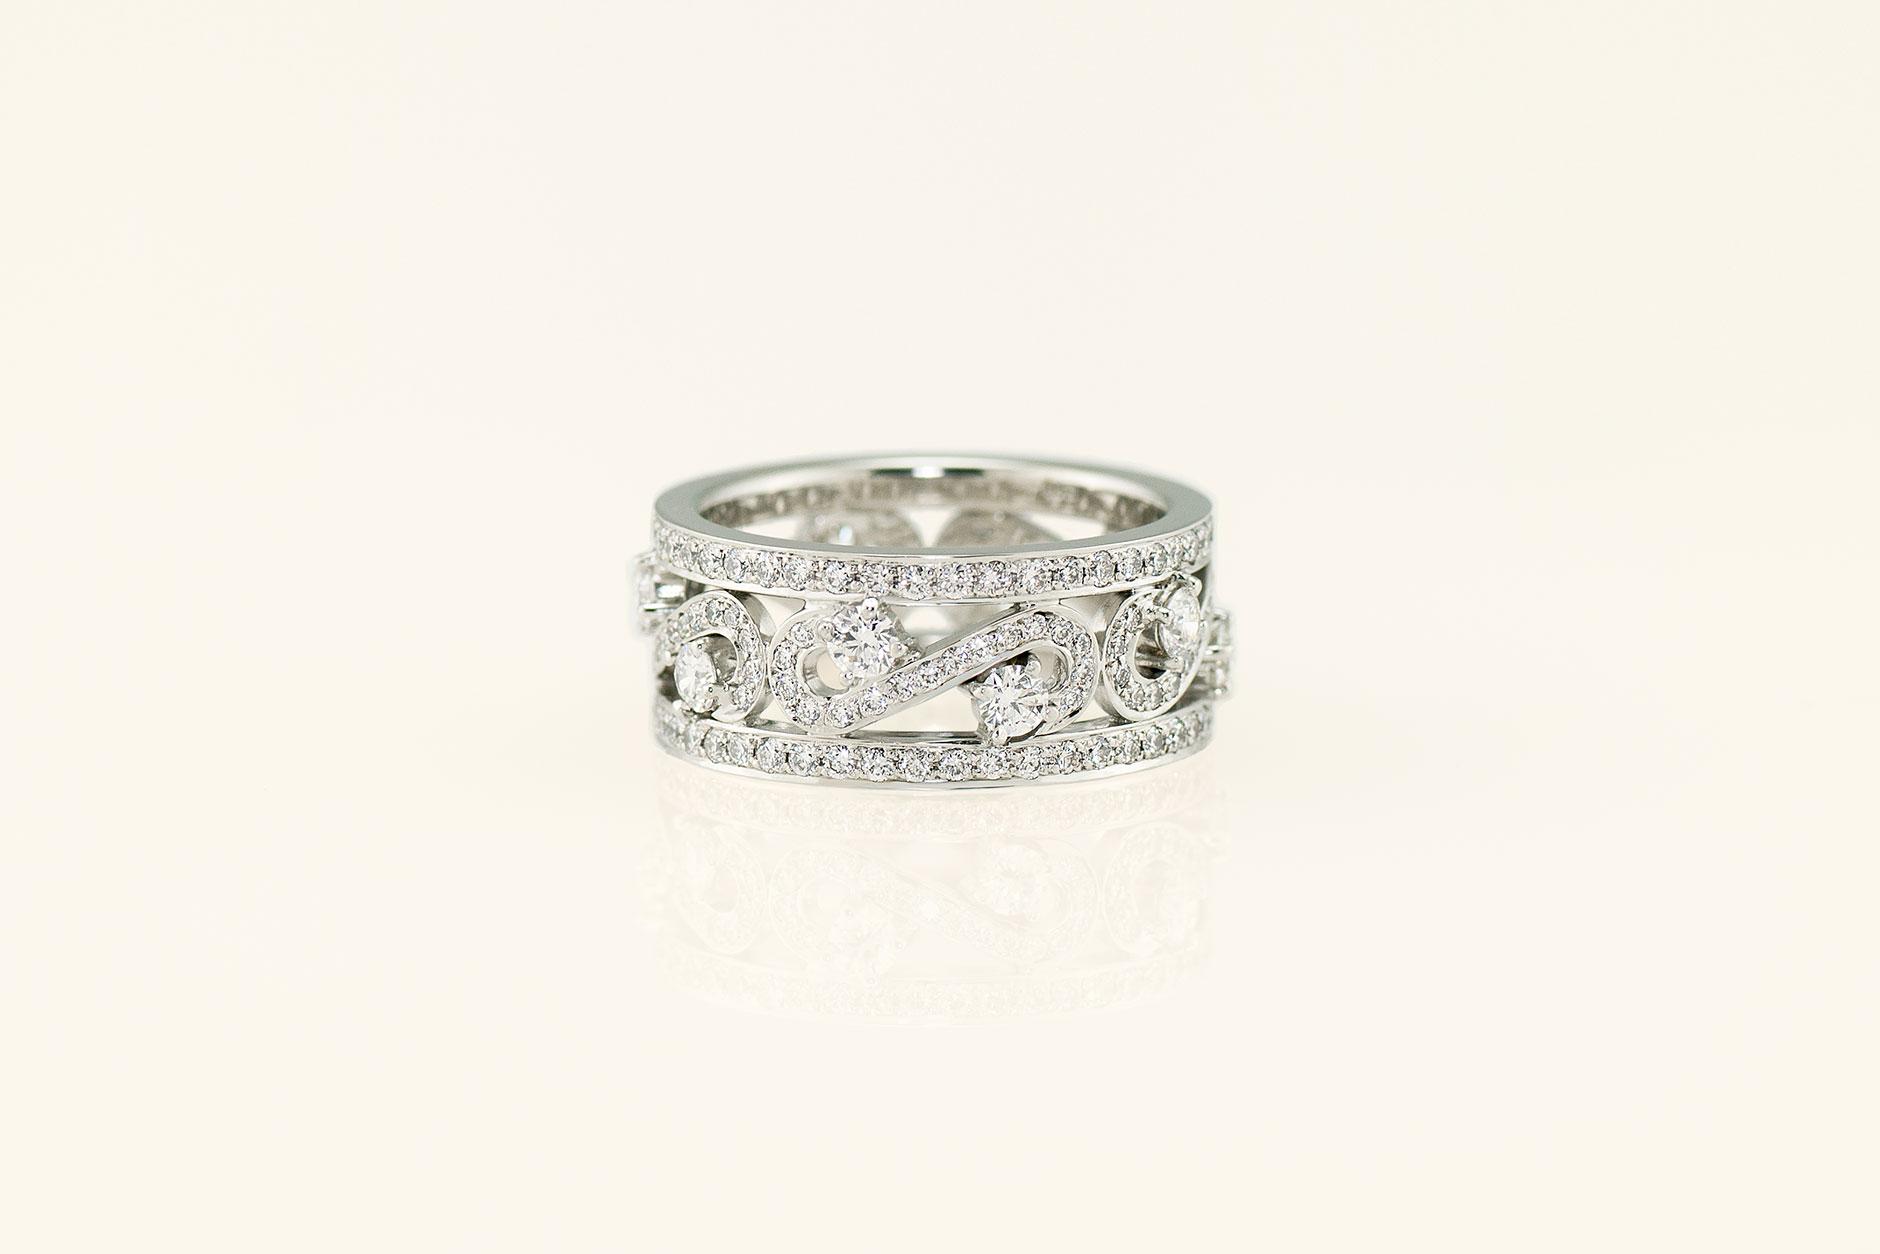 Handcrafted 19k White Gold Diamond Scroll Ring - NEWA Goldsmith